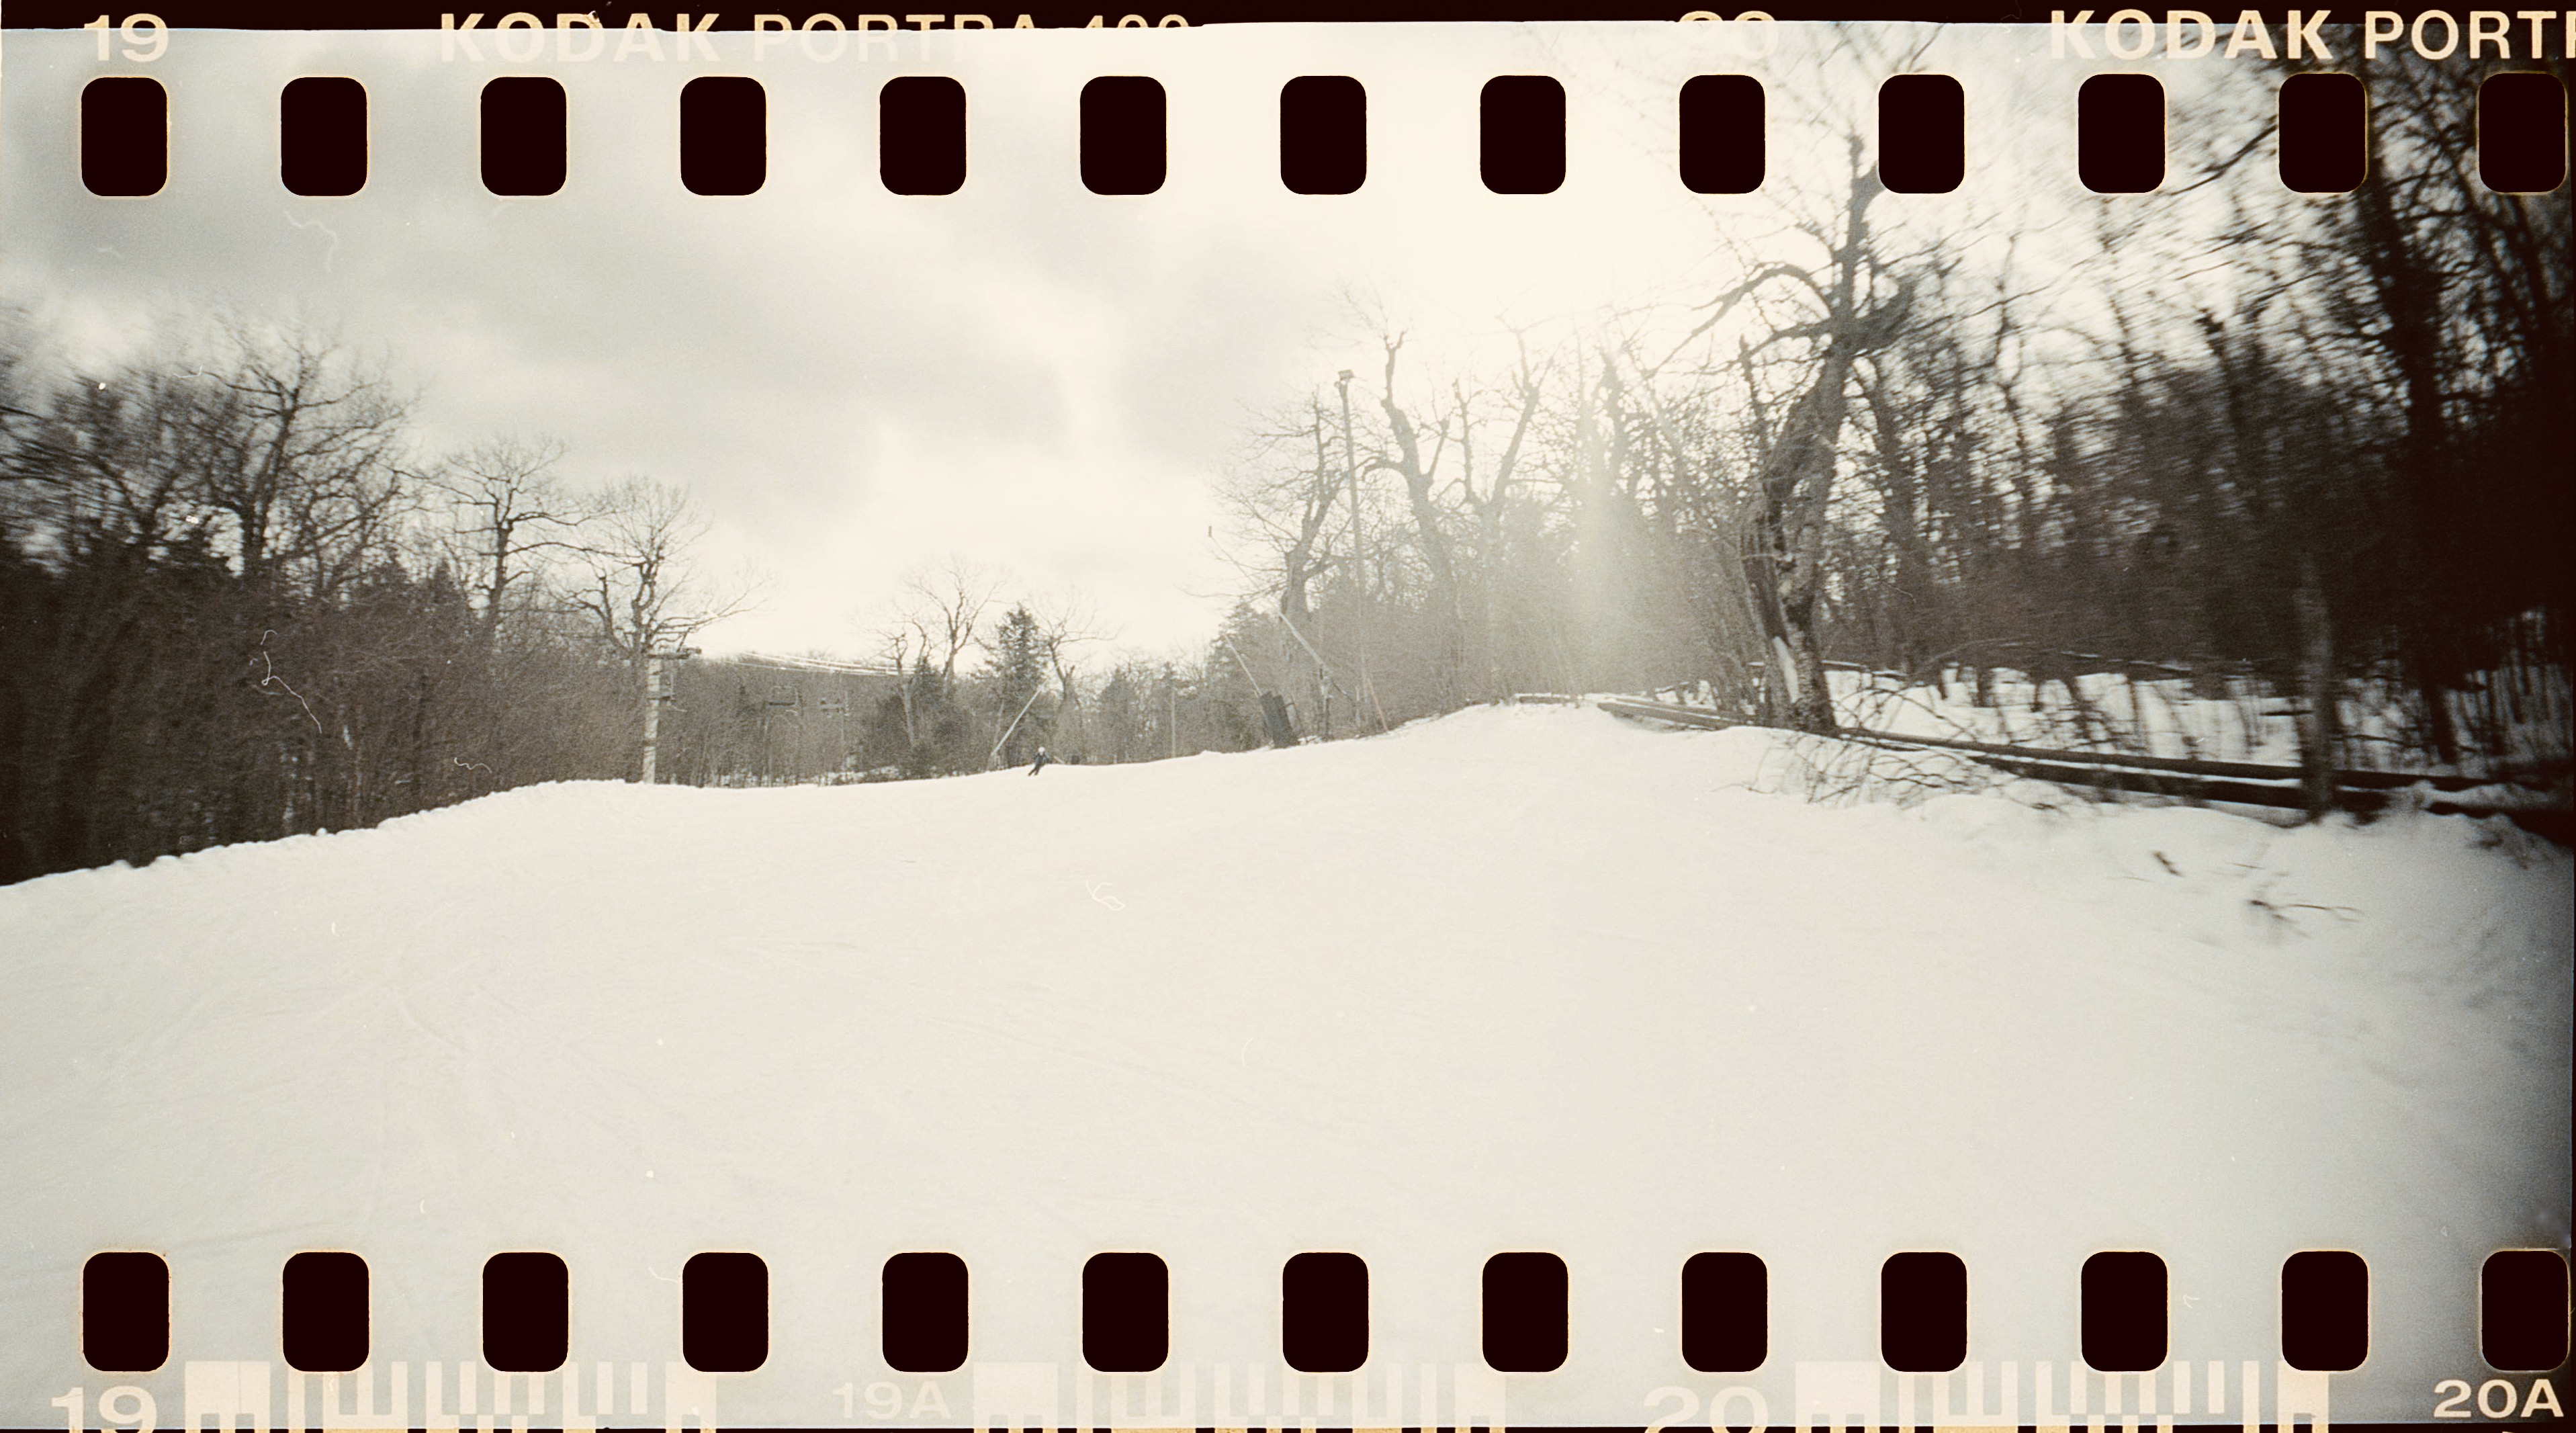 massachusetts wachusett slope sprocket rocket sprocket film 1